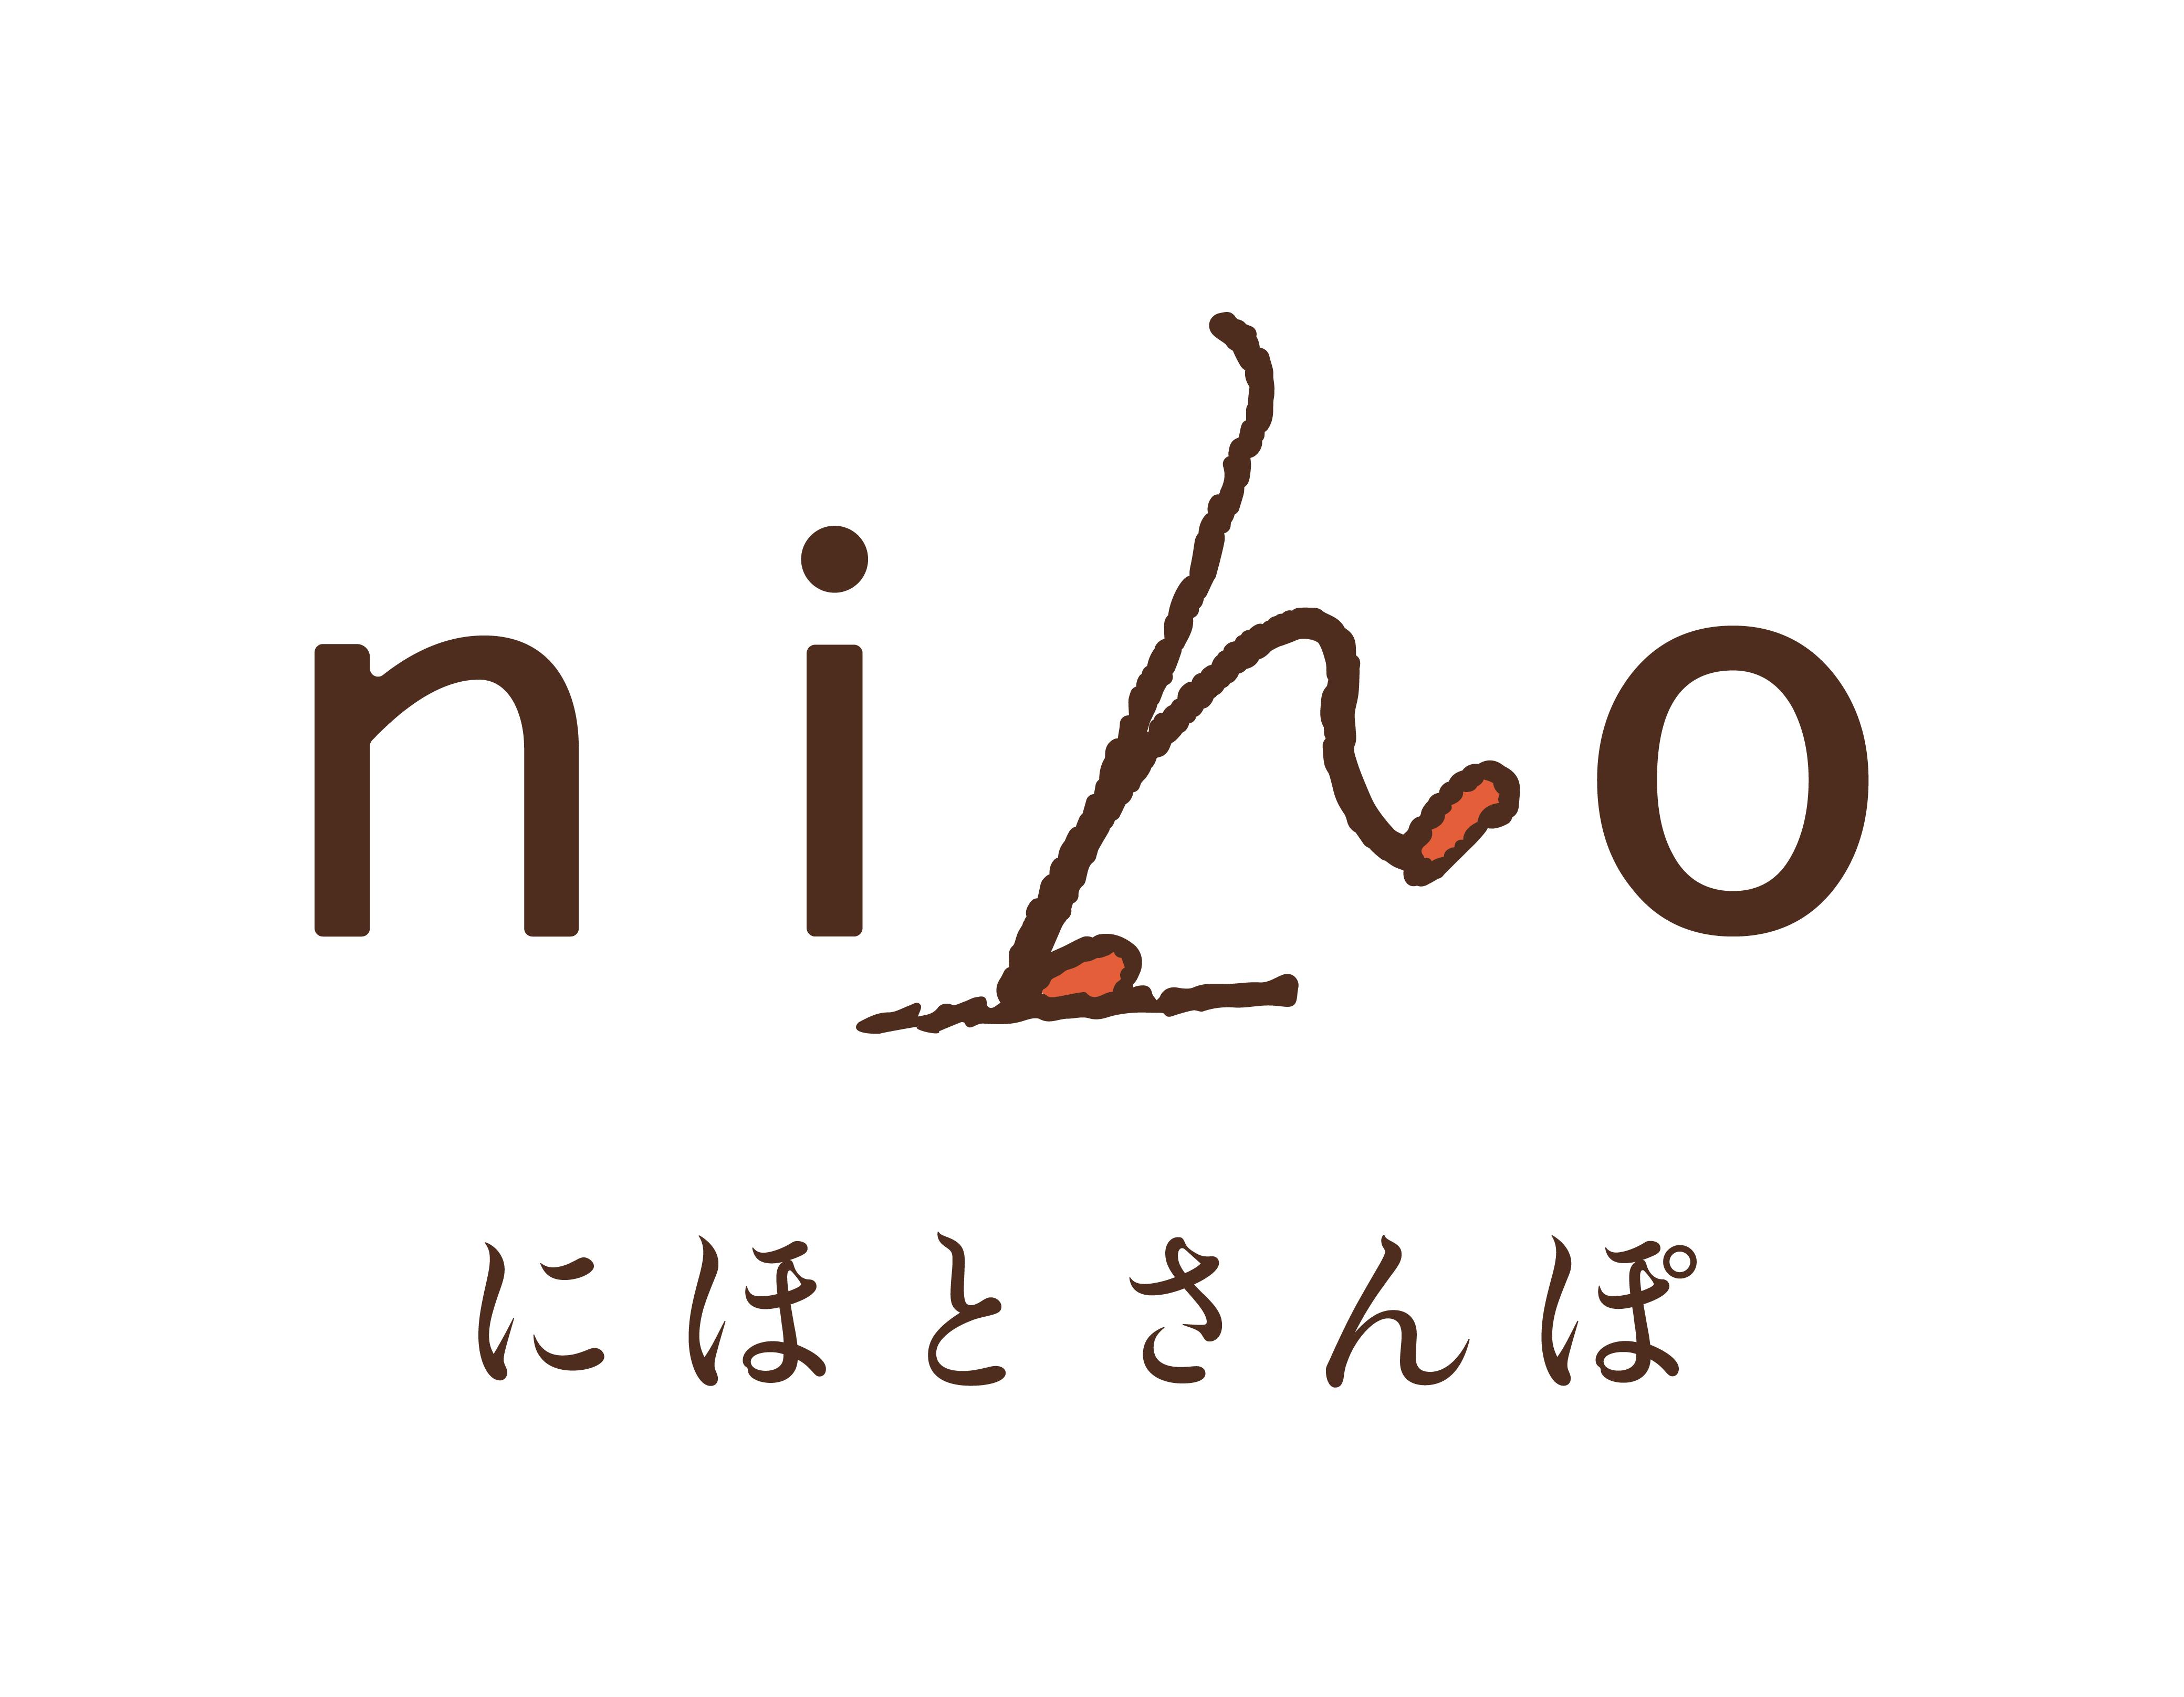 【dfshop 瓦版 06号】 -ブランドロゴ「niho」完成!-